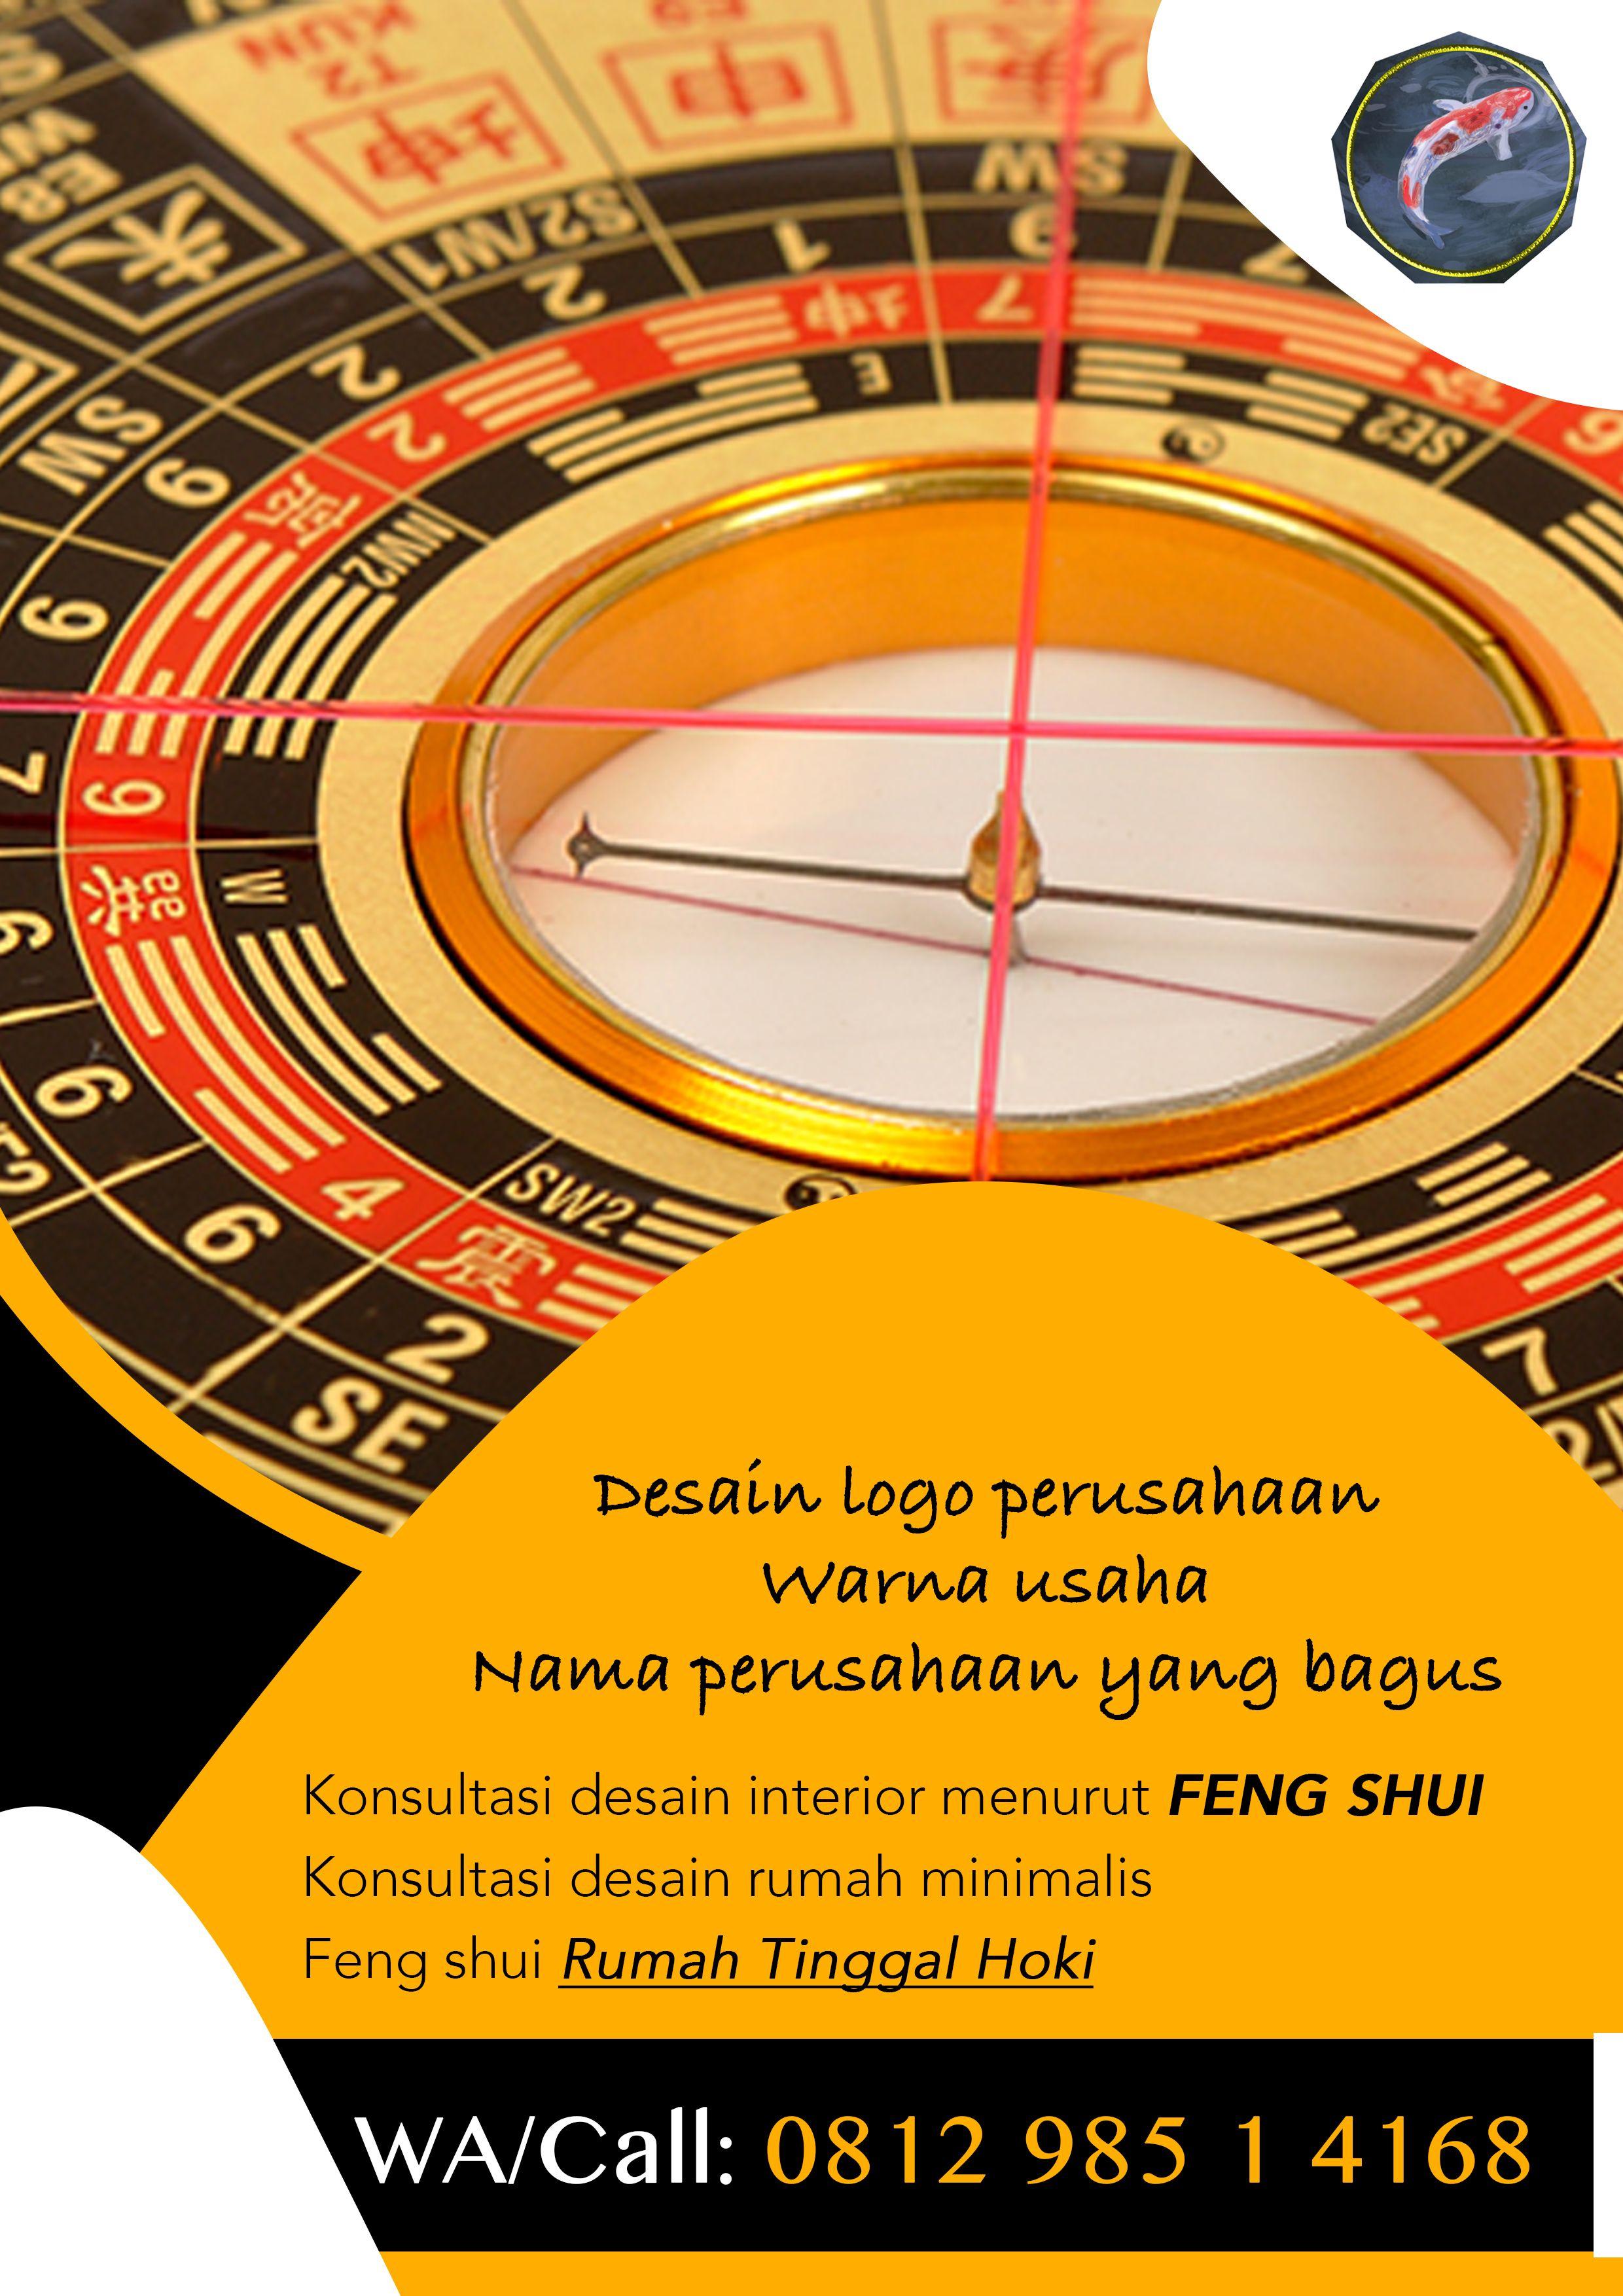 Nama Usaha Rumahan Nama Usaha Rumah Makan Nama Usaha Roti Yang Unik Nama Usaha Rental Mobil Nama Usaha Restoran Nama Usa Feng Shui Desain Fasad Desain Web Warna keberuntungan untuk usaha